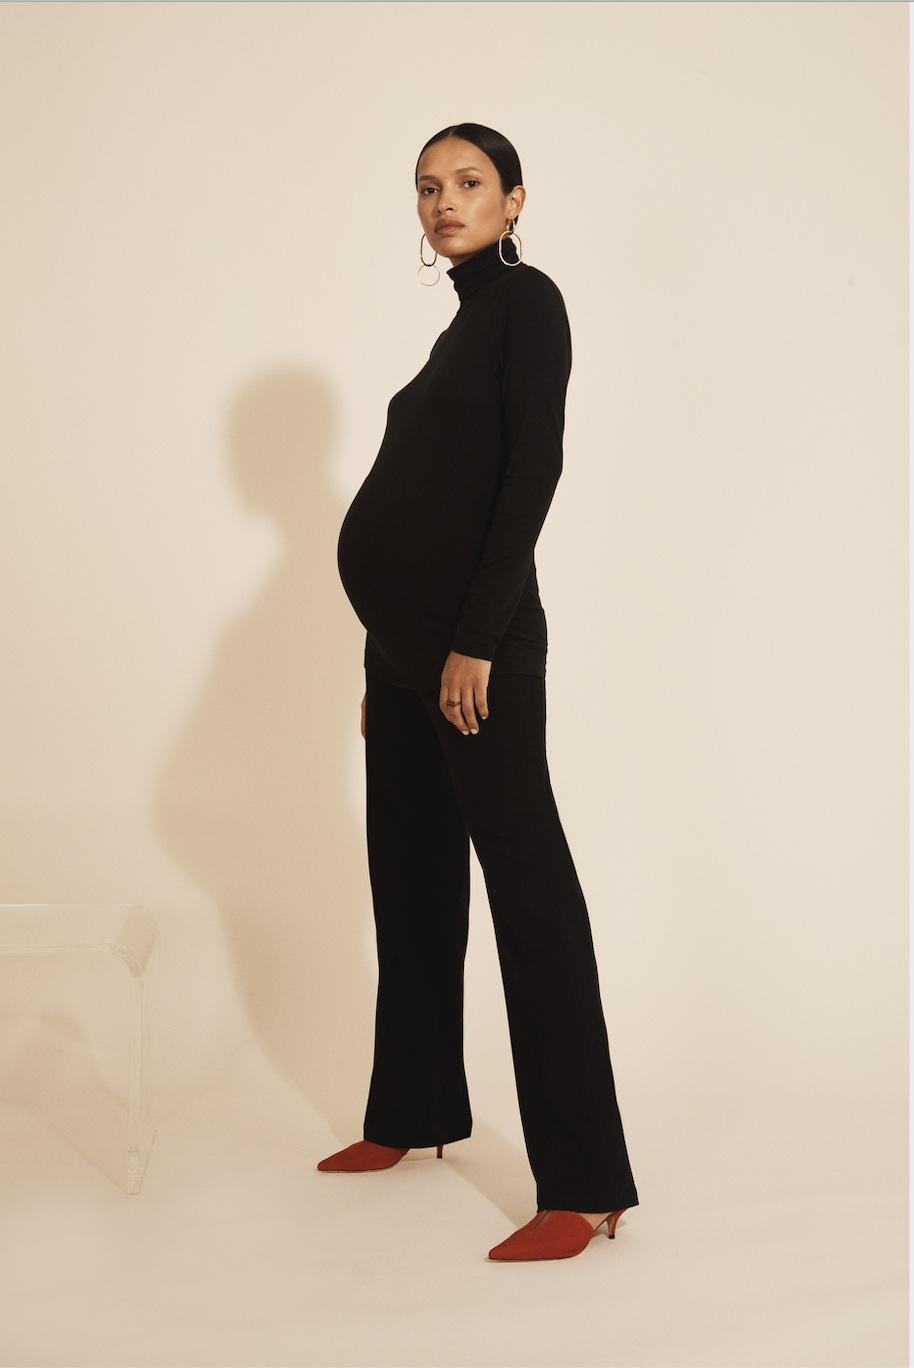 Tellus+Mater+-+Maternity+Clothing+-+Clothing+for+Pregnant+Women+%2849%29.jpg